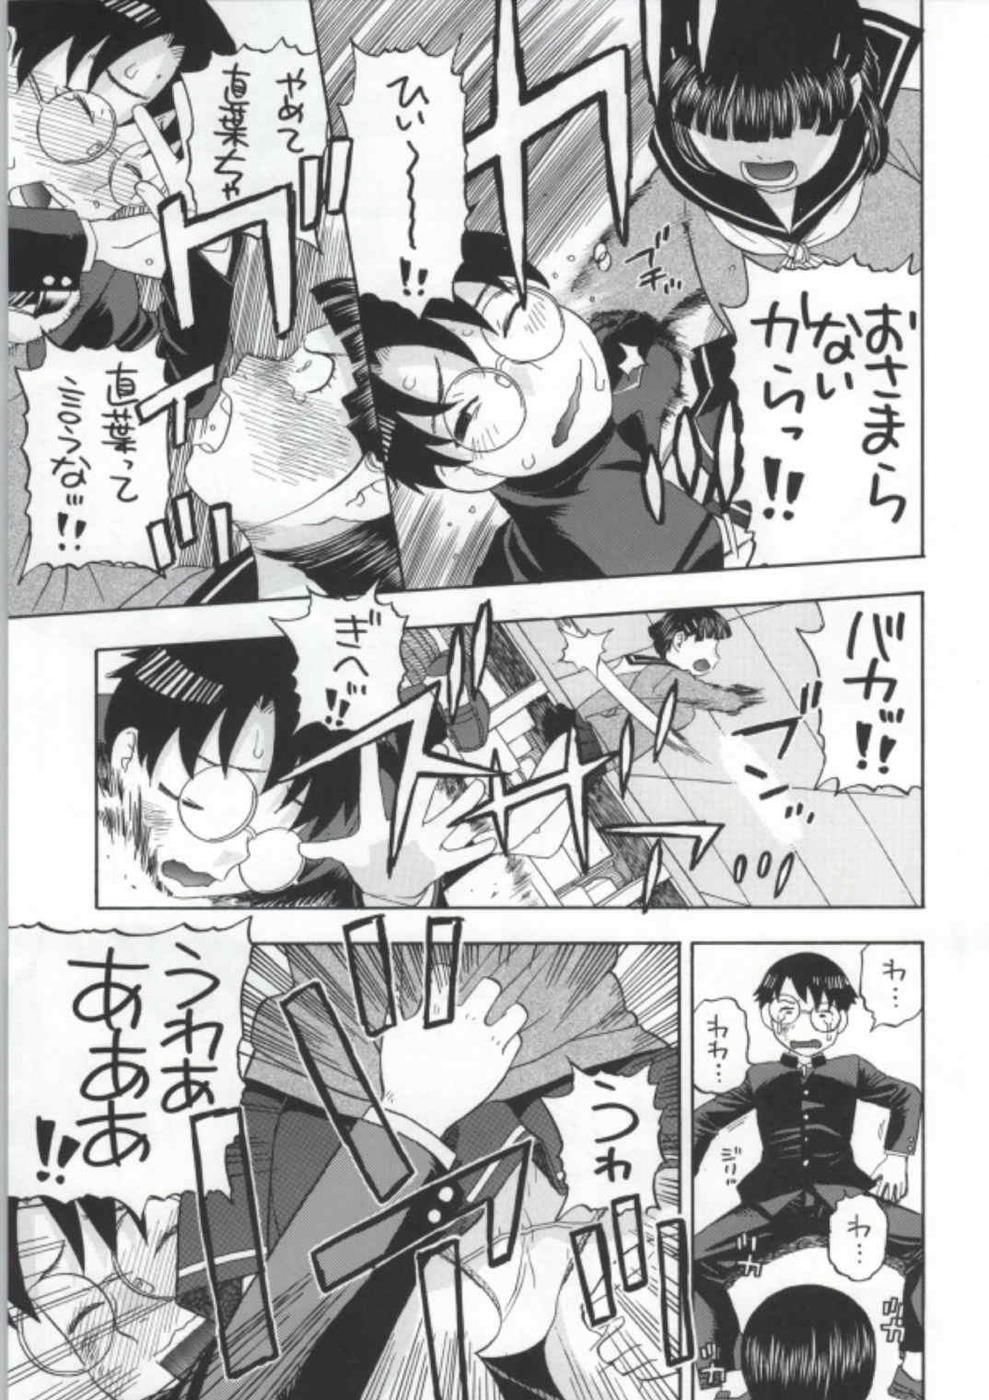 Suguha-chan ga Ikenain Dakara ne 11